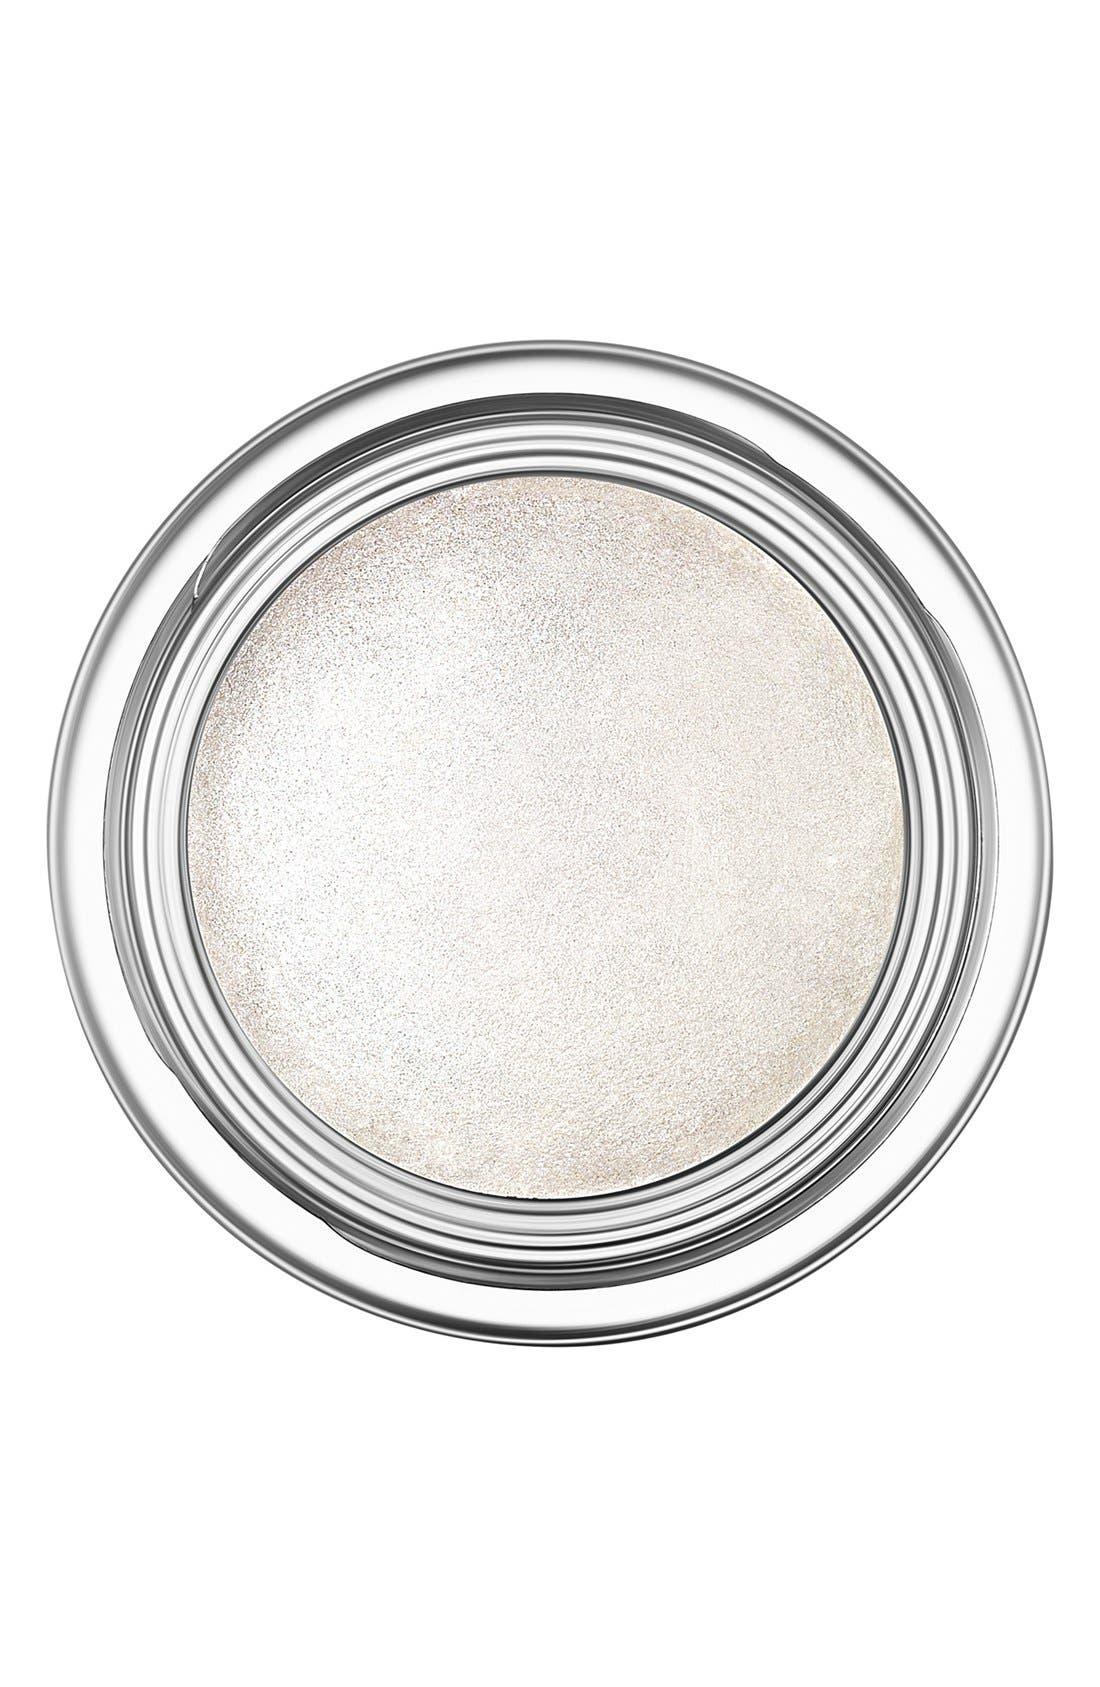 Diorshow Fusion Mono Eyeshadow,                             Main thumbnail 1, color,                             001 LUNE